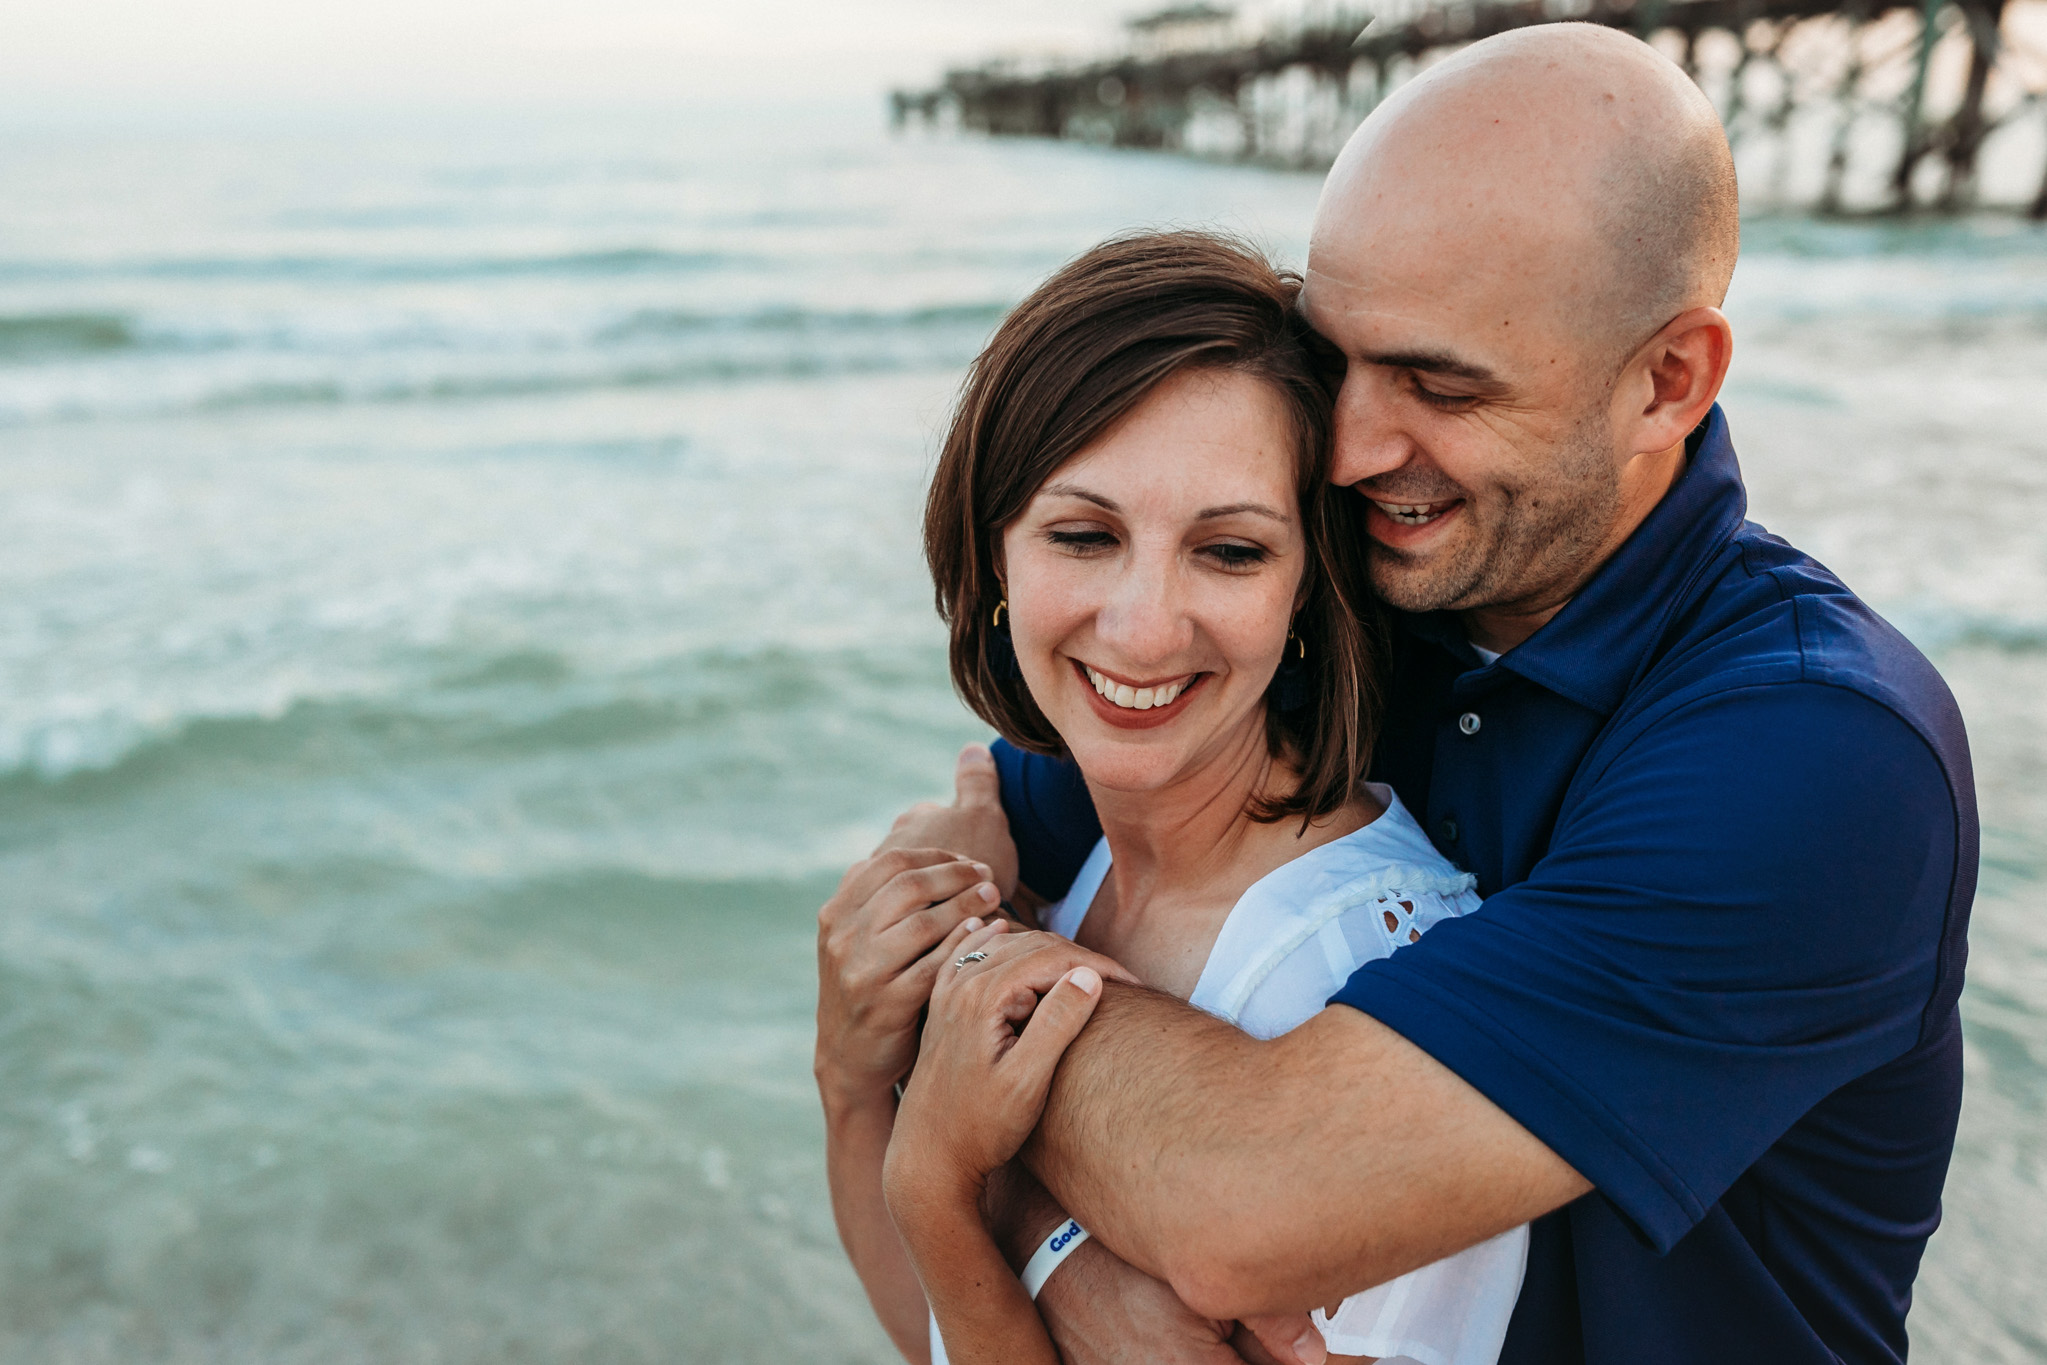 Tampa Family Photographer_Jennifer Kielich Photography_Niki for blog-30.jpg